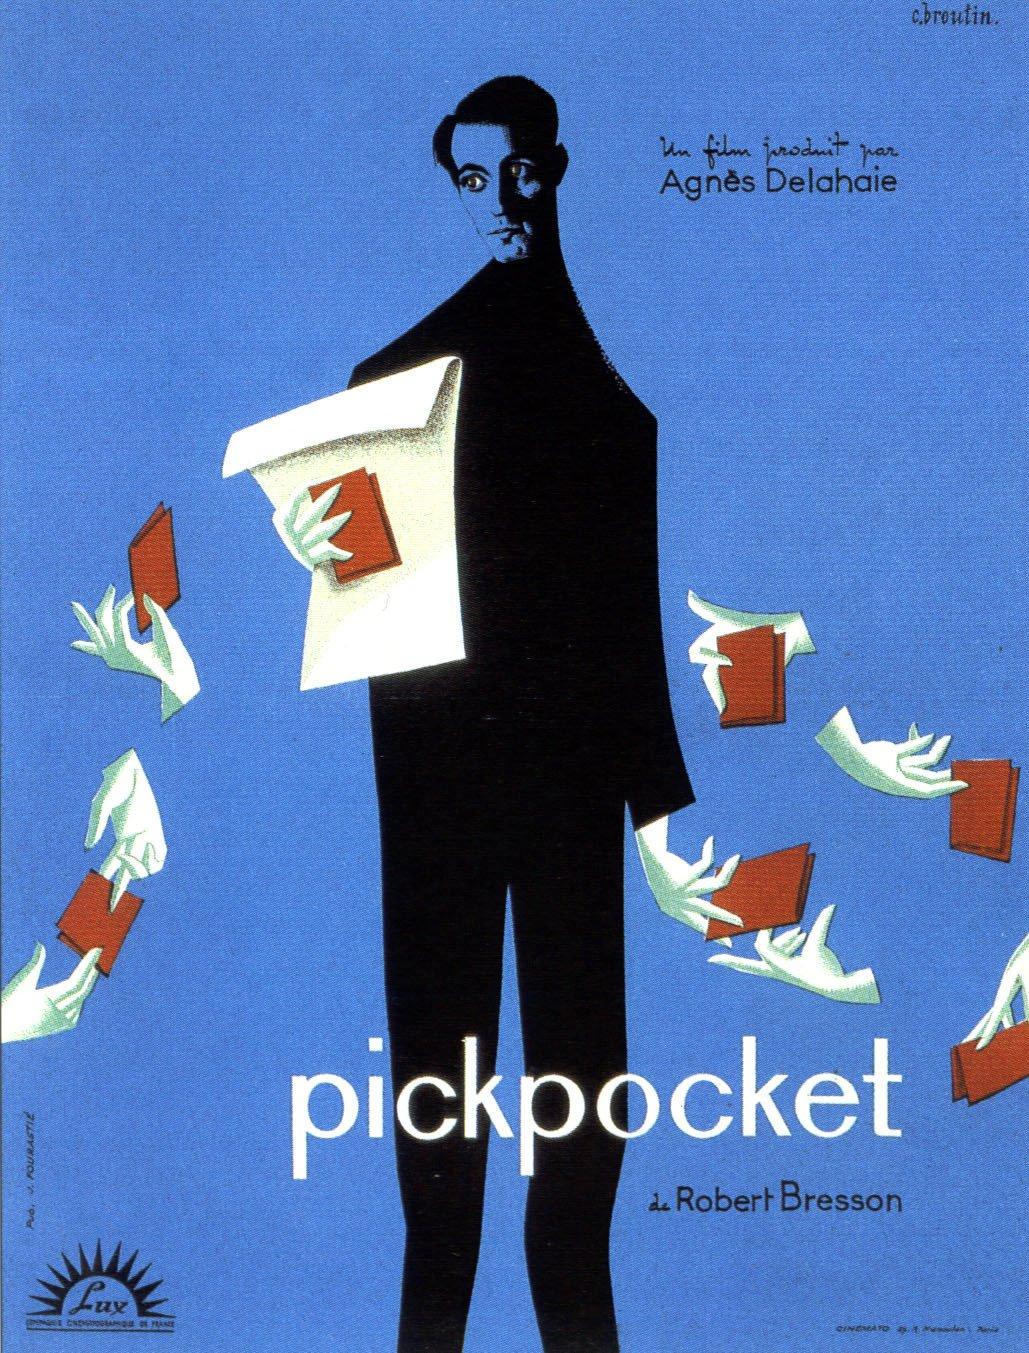 Regarder Pickpocket en streaming gratuit